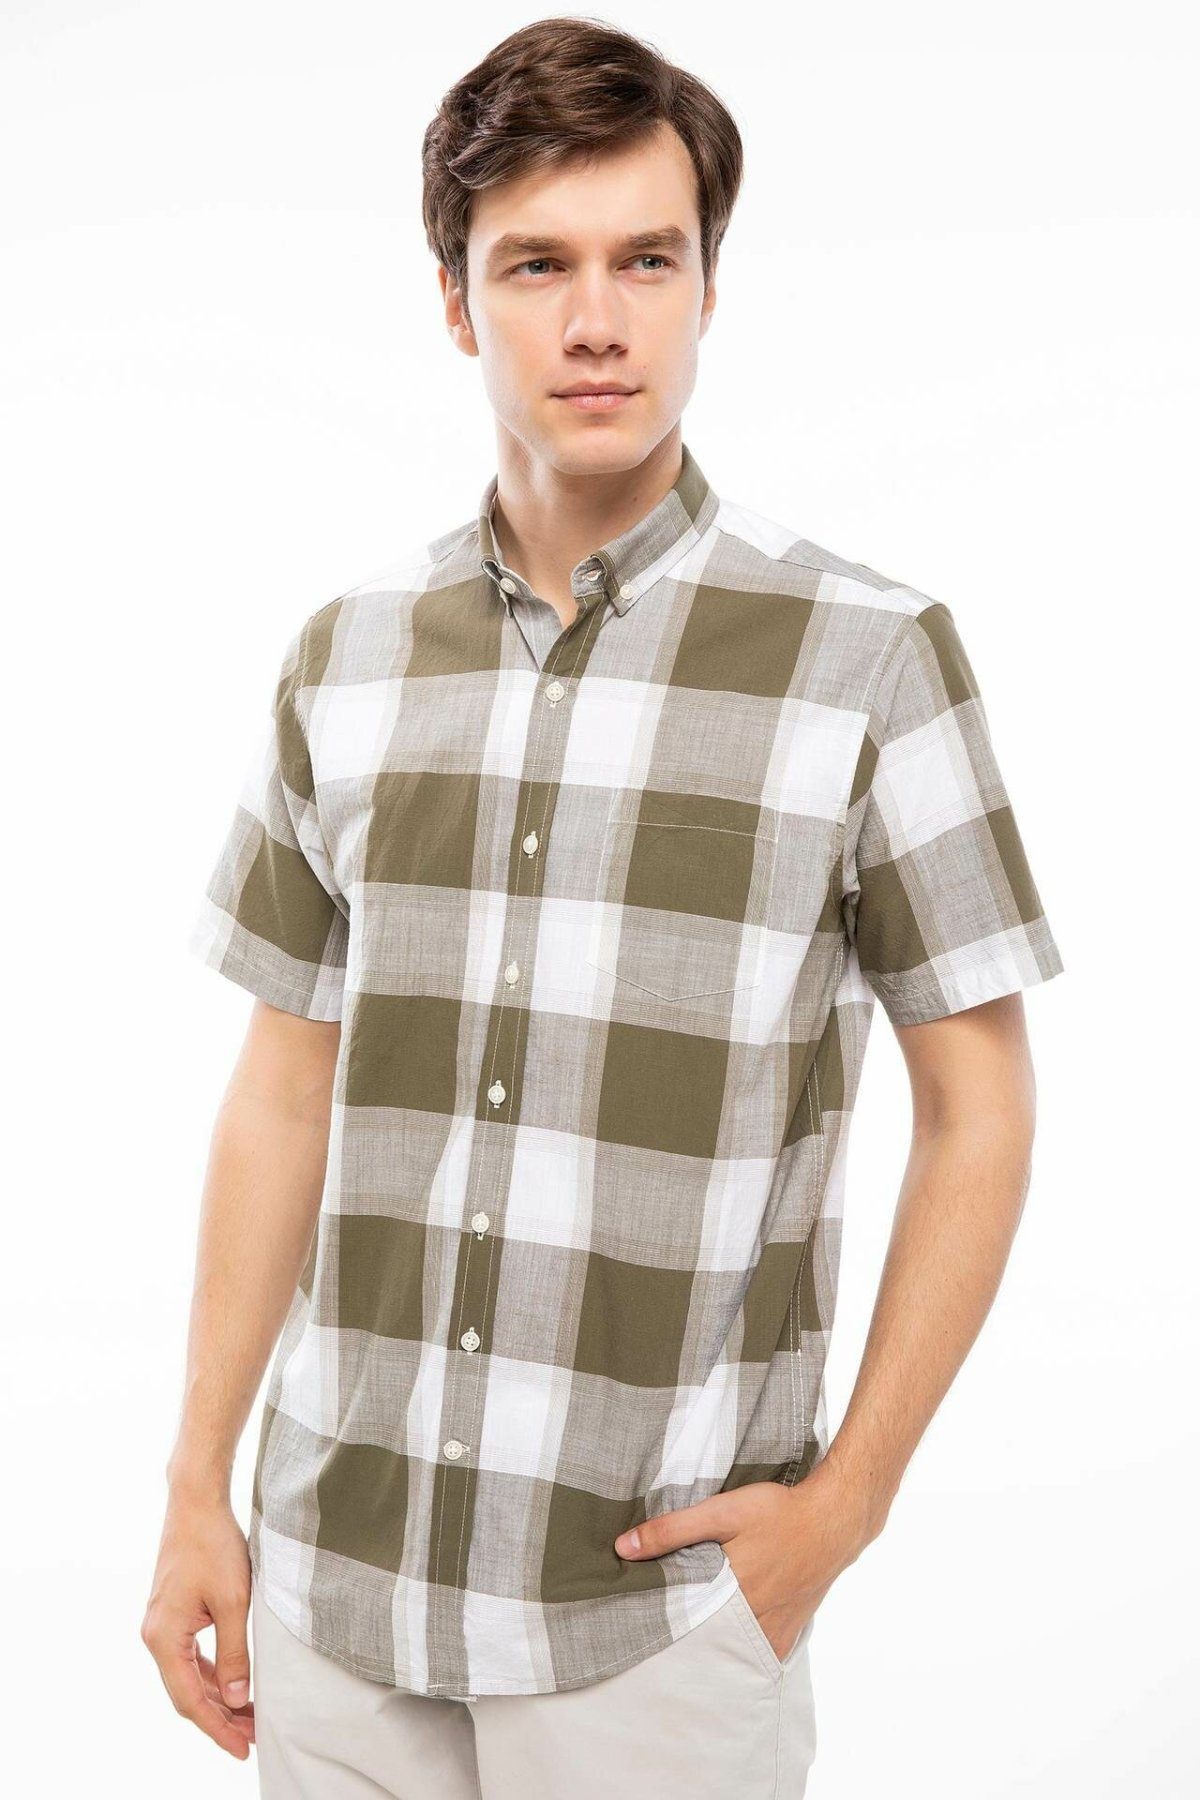 DeFacto Men Plaid Shirts Short Sleeve Casual Shirts Mens Fashion Lapel Collar Casual Cotton Shirt - I3821AZ18SM